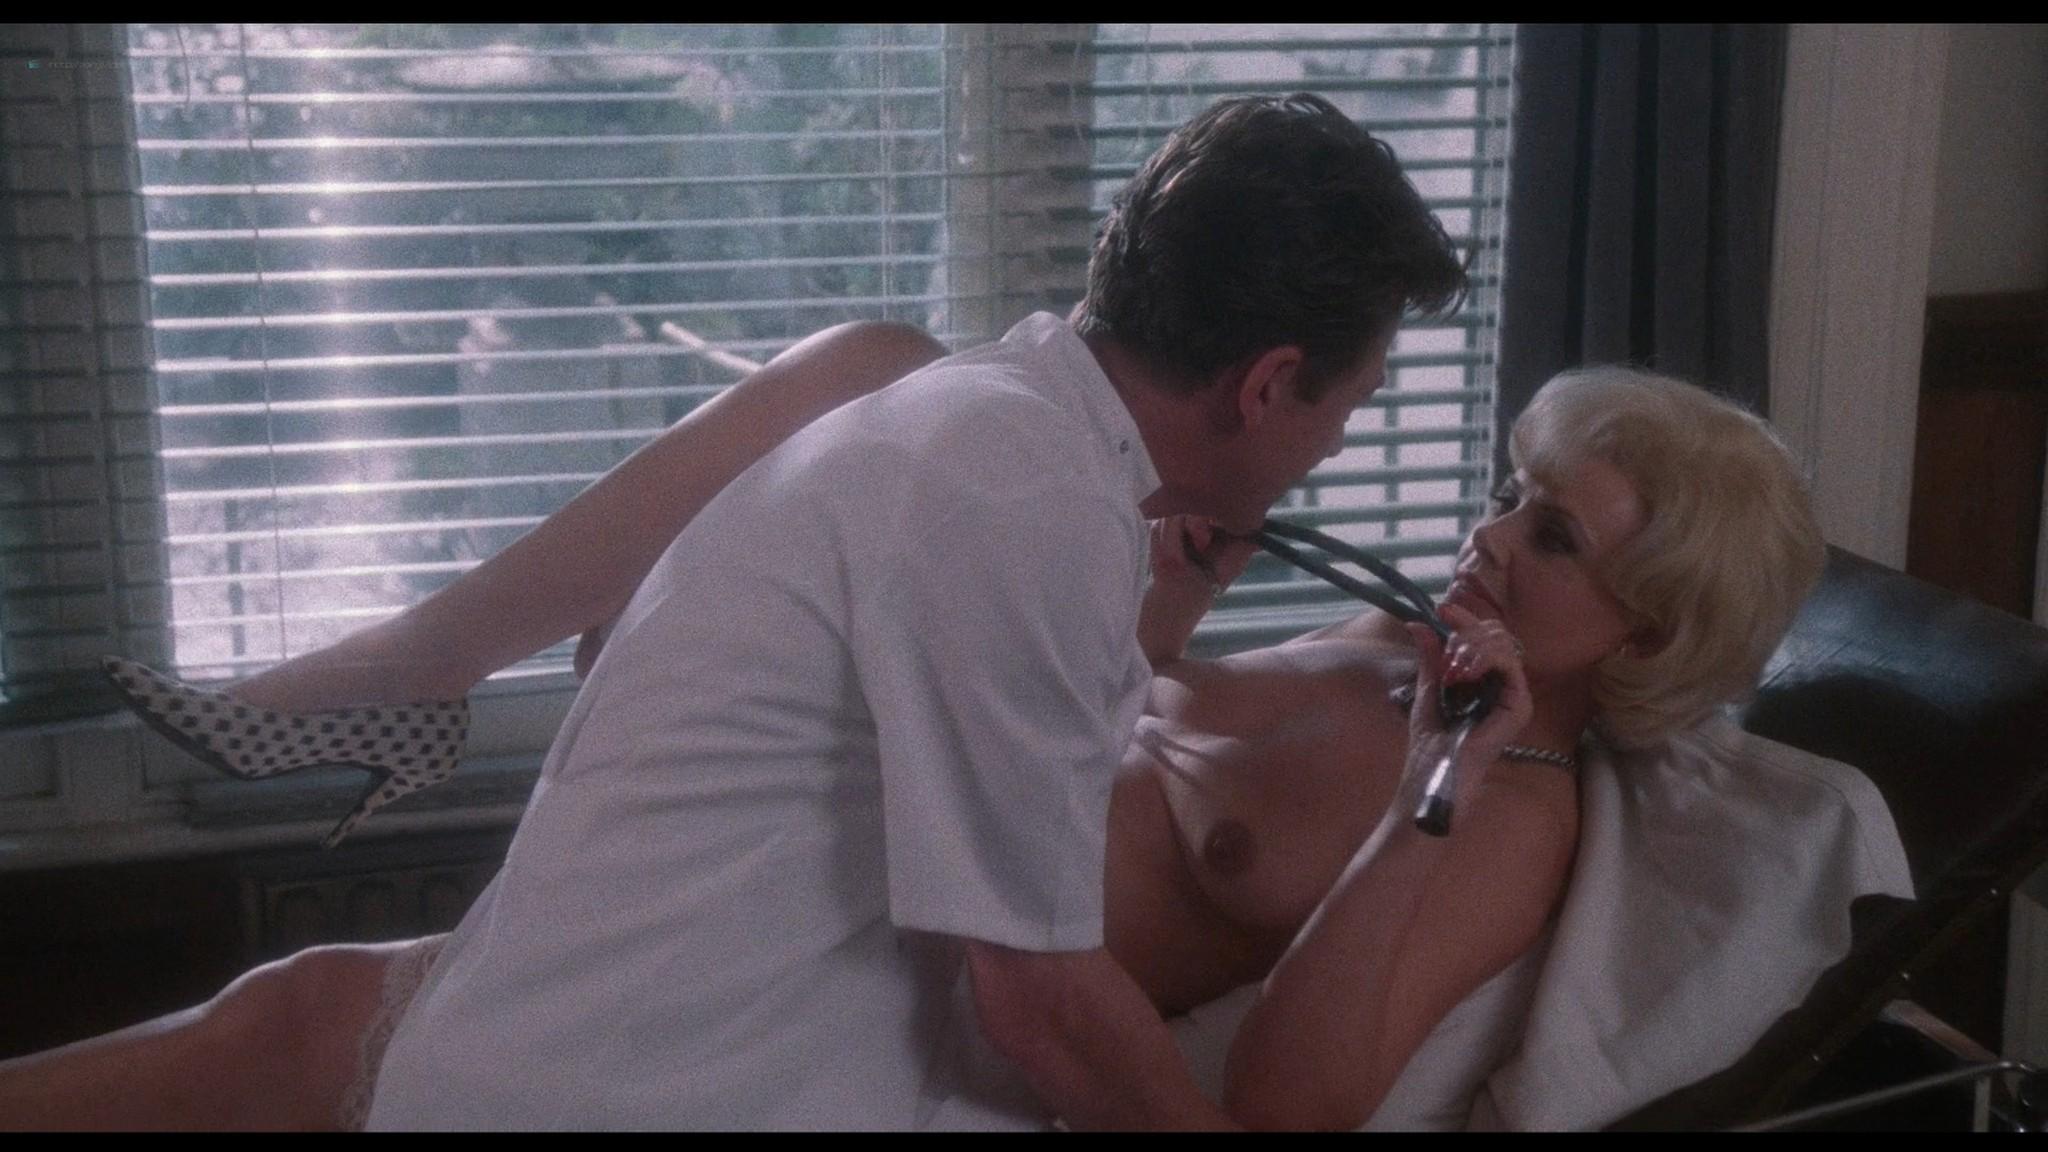 Bridget Fonda nude butt boobs Britt Ekland nude Joanne Whalley hot - Scandal (1989) HD 1080p BluRay (9)